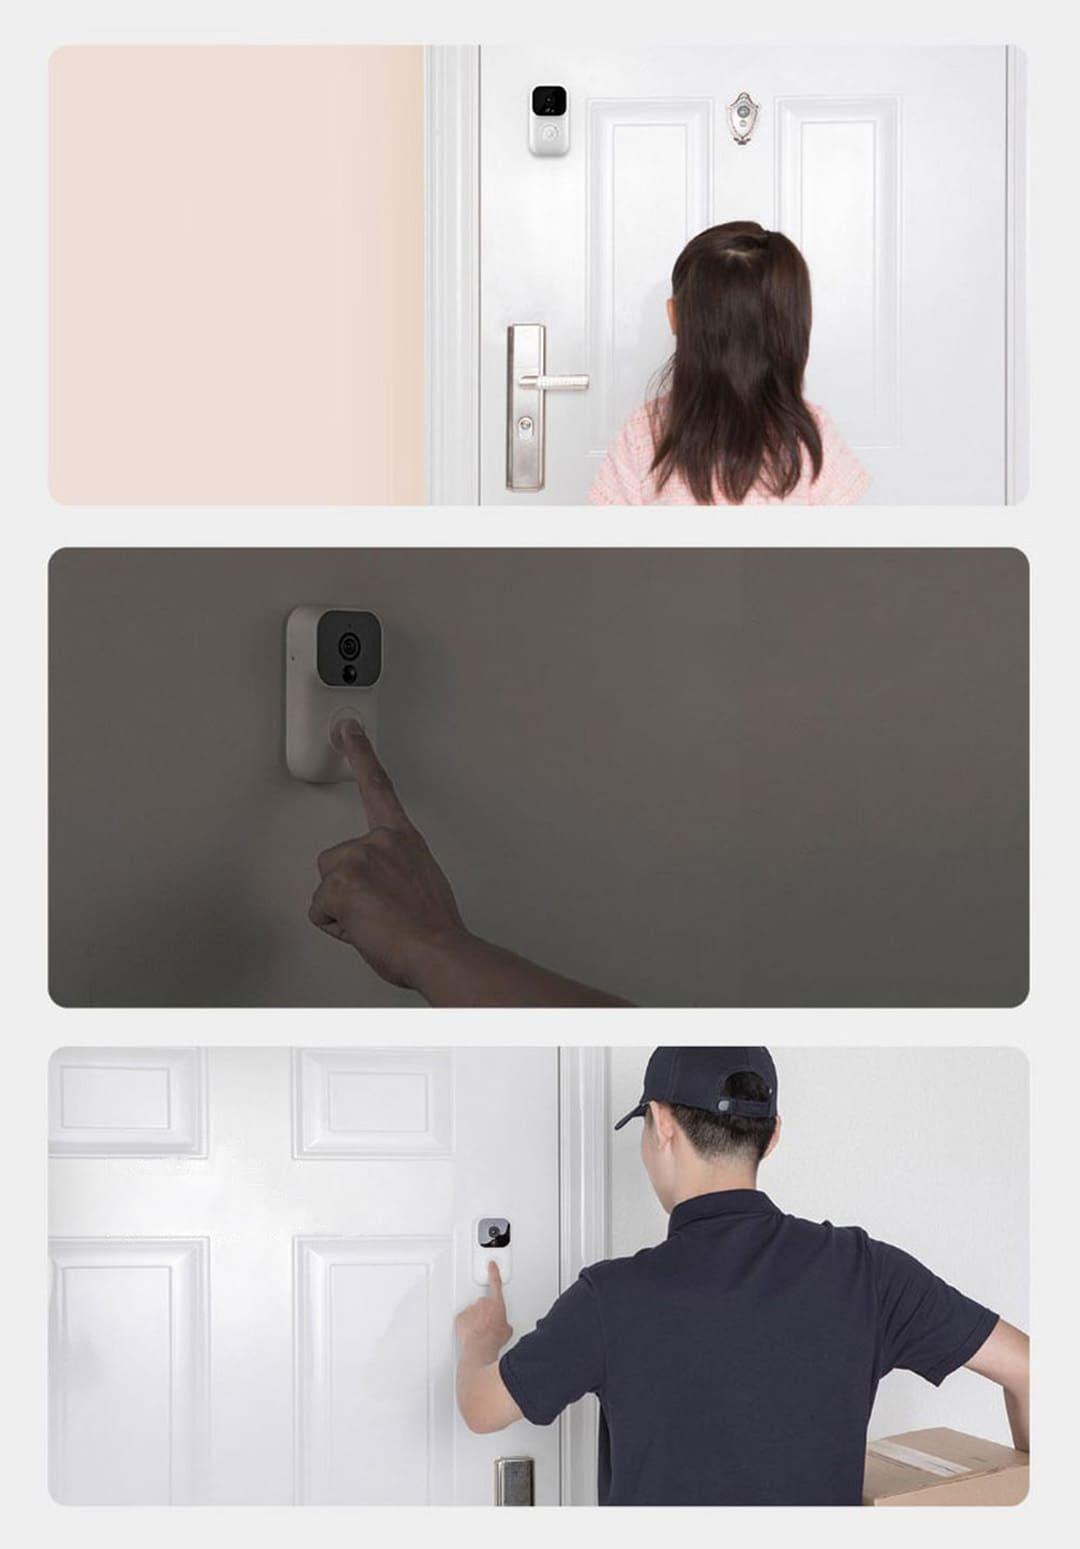 Дверной звонок Xiaomi Mijia Video Doorbell Enhanced Version FJ04MLWJ robot4home.ru